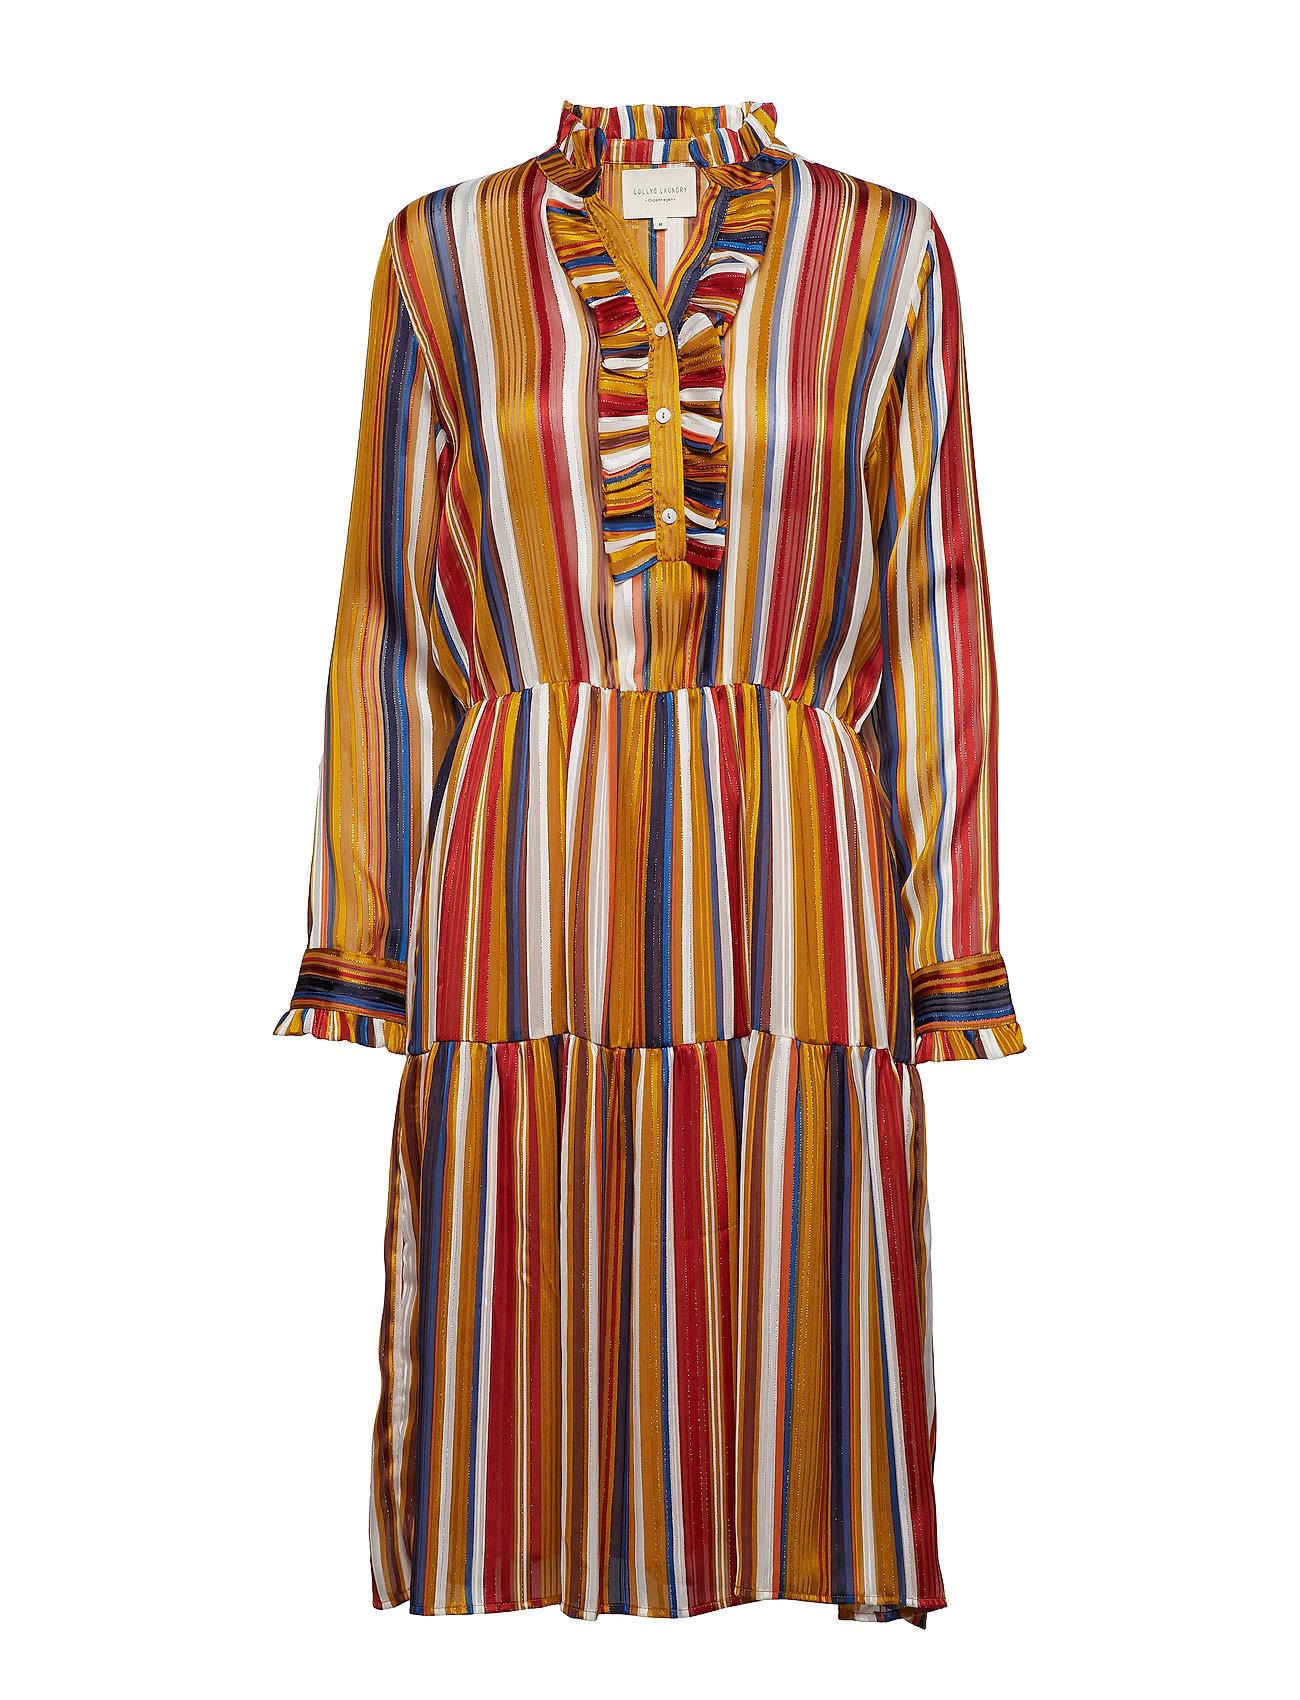 Lollys Laundry Haley Dress - MUSTARD